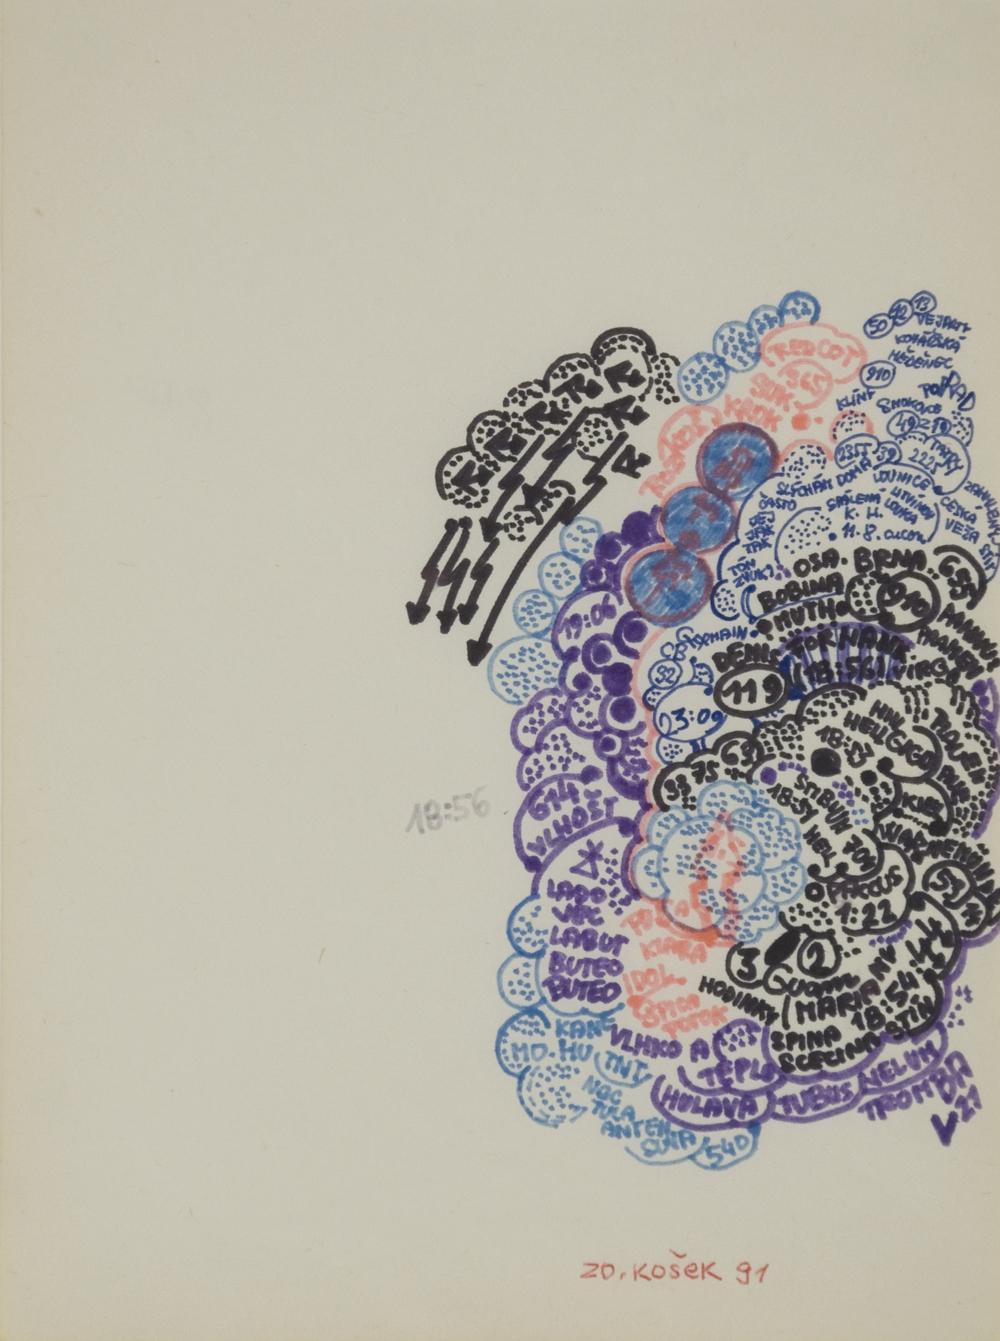 Zdenek Kosek    Untitled  , 1991 Ink, marker/paper 7.75 x 5.75 inches / 19.7 x 14.6 cm / ZKo 84